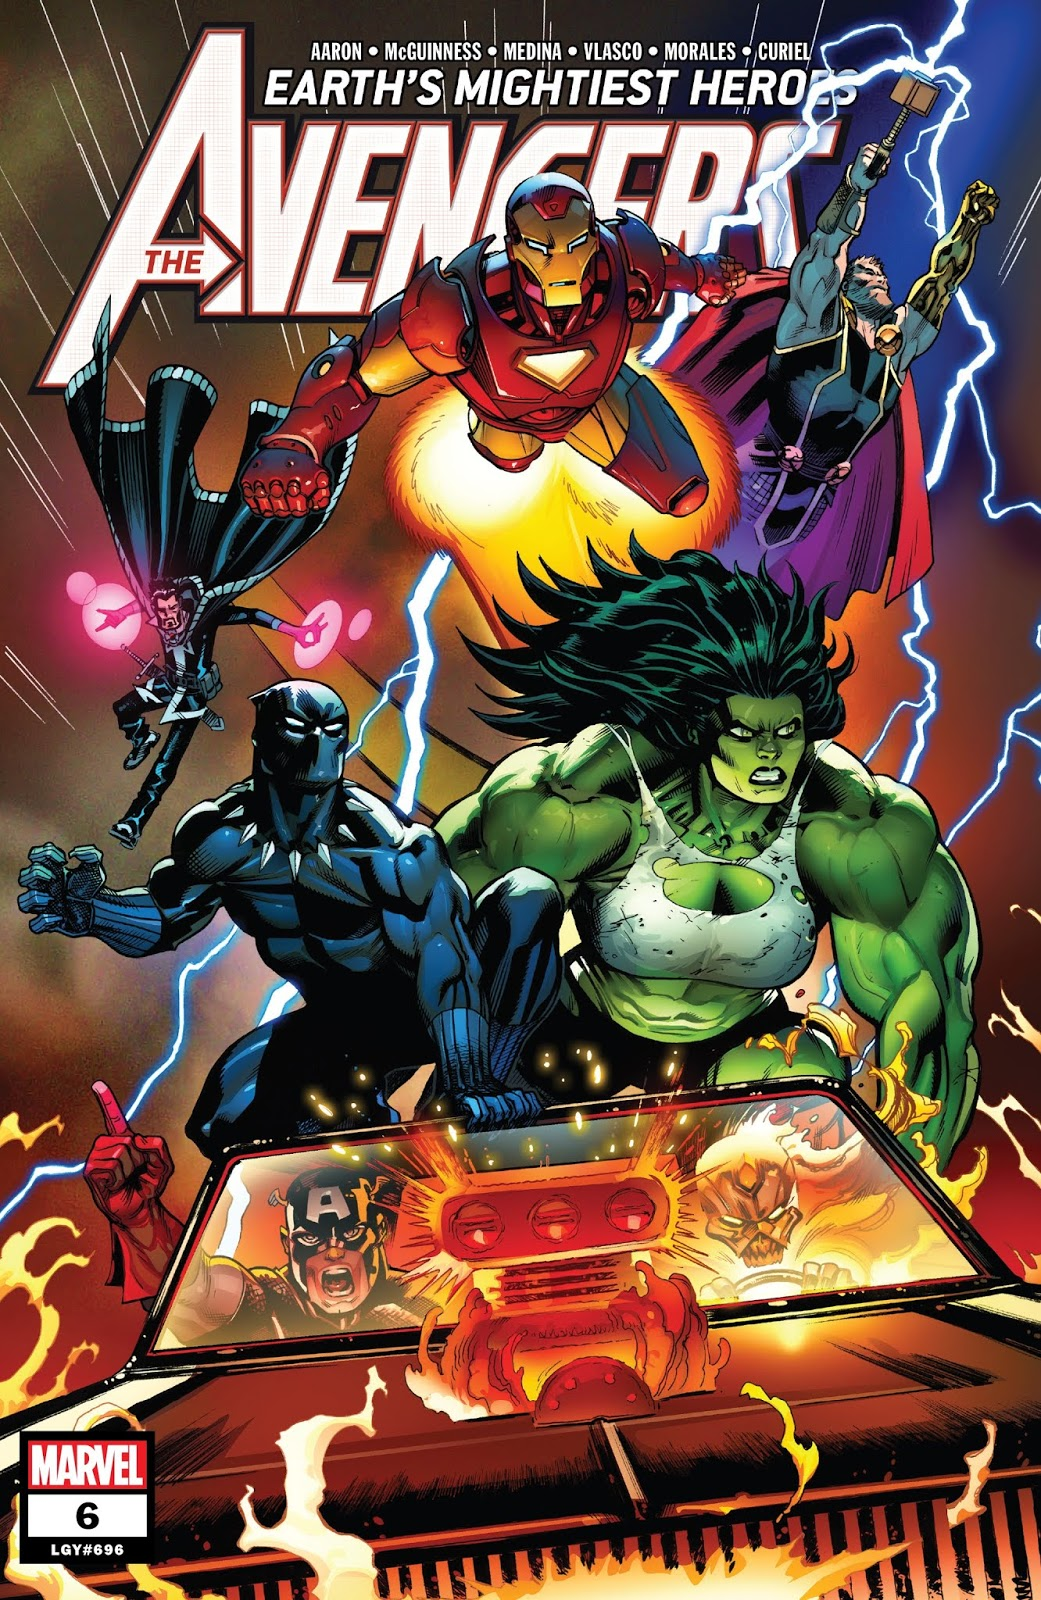 The Avengers: Marvel Comics Universe & Avengers #6 Spoilers: The Final